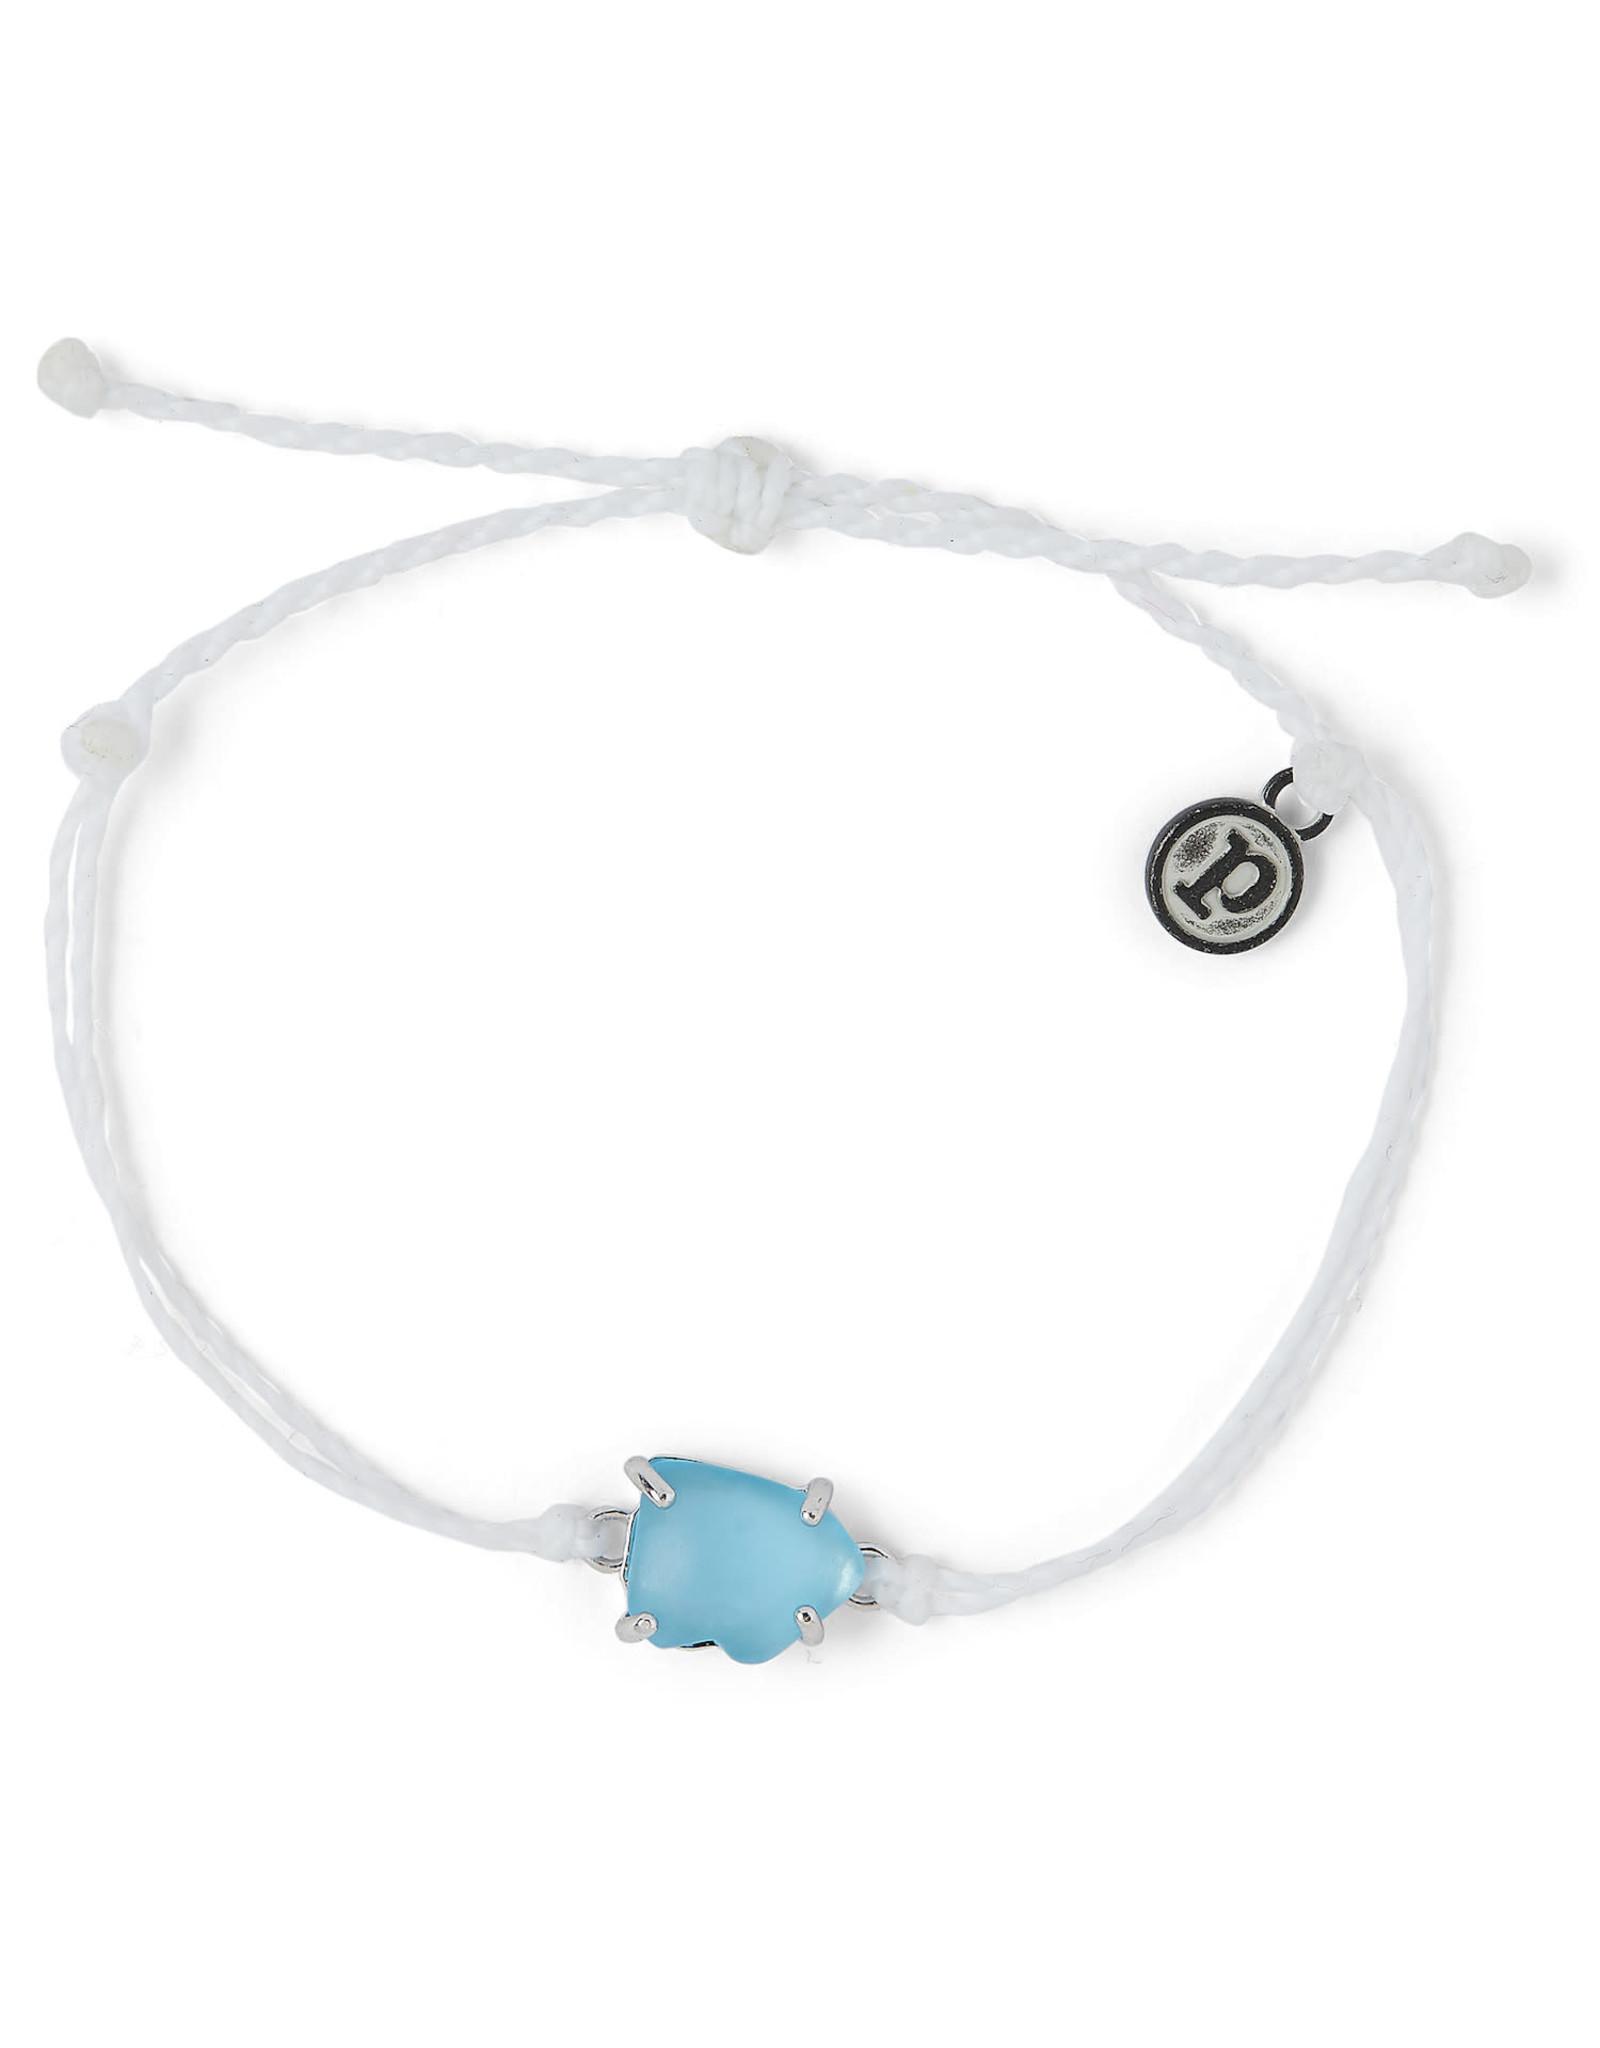 PURA VIDA BRACELET BLUE SEAGLASS WHITE